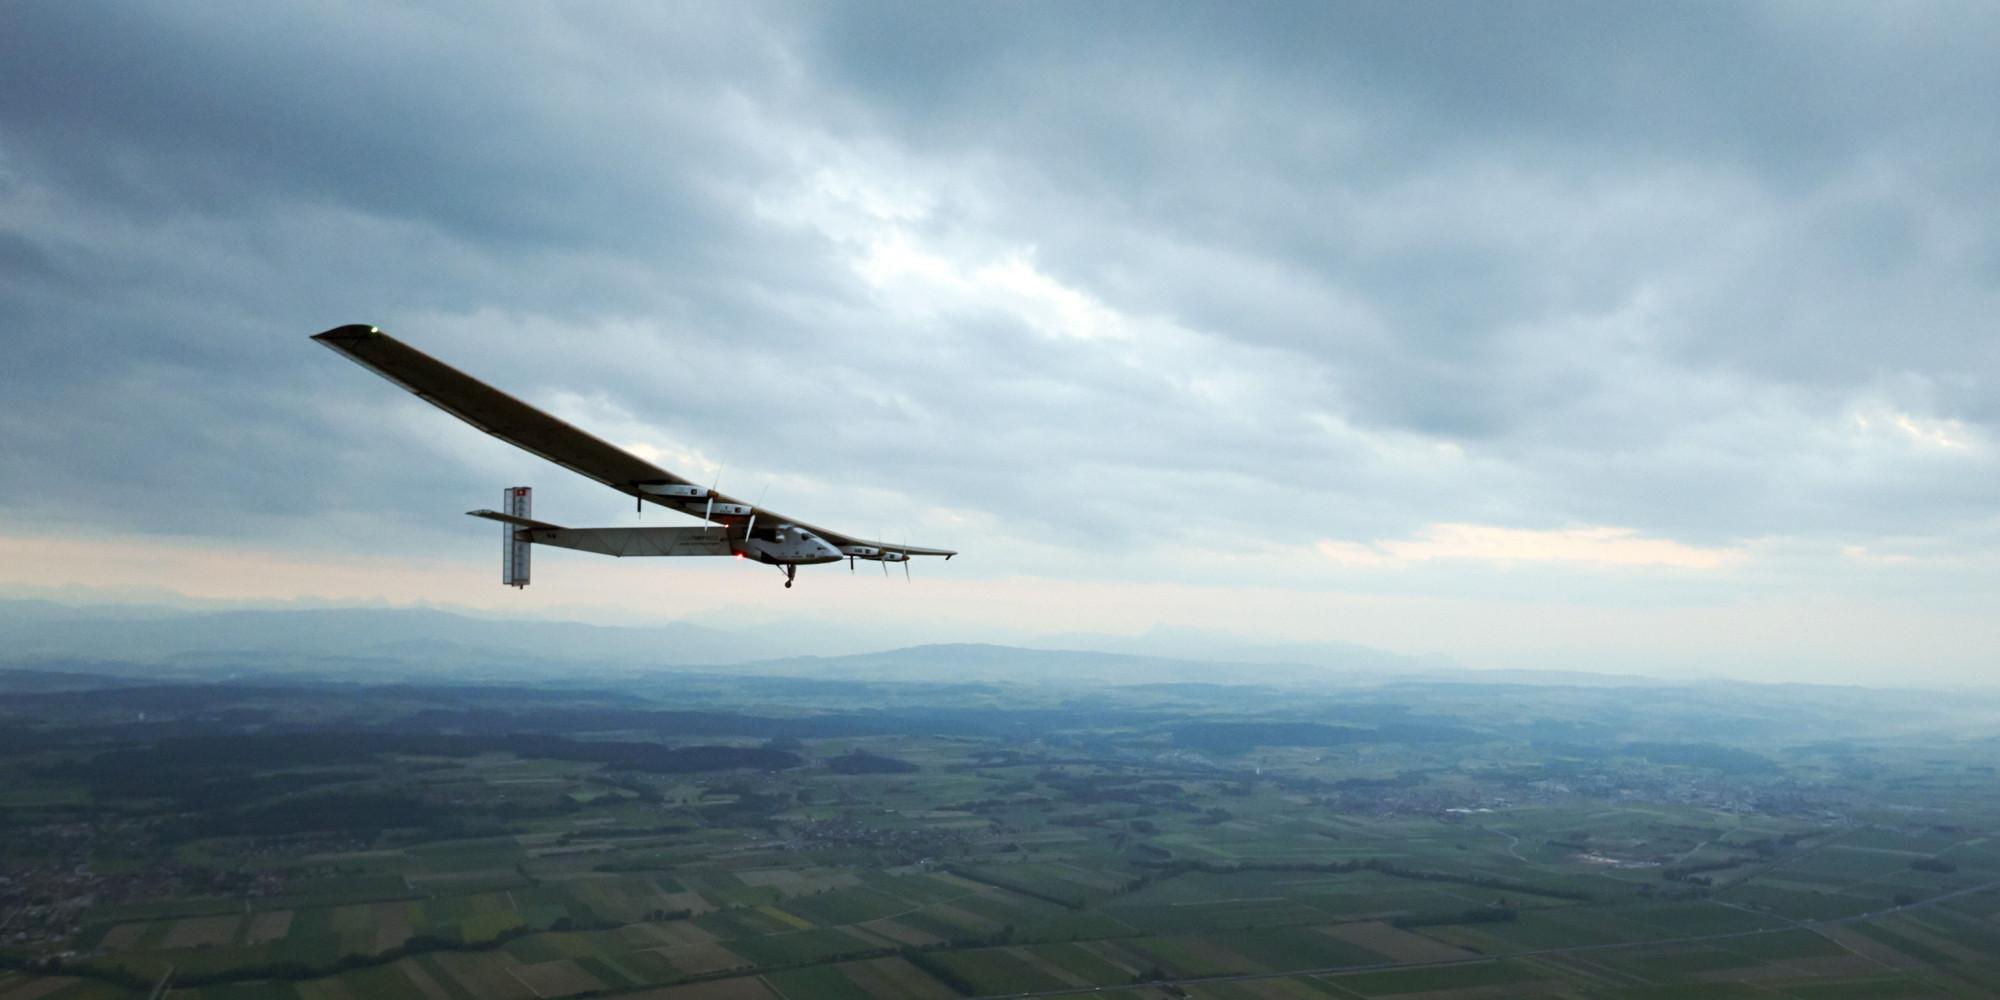 infographie  solar impulse 2  l u0026 39 avion  u00e0  u00e9nergie enti u00e8rement solaire  entame son tour du monde